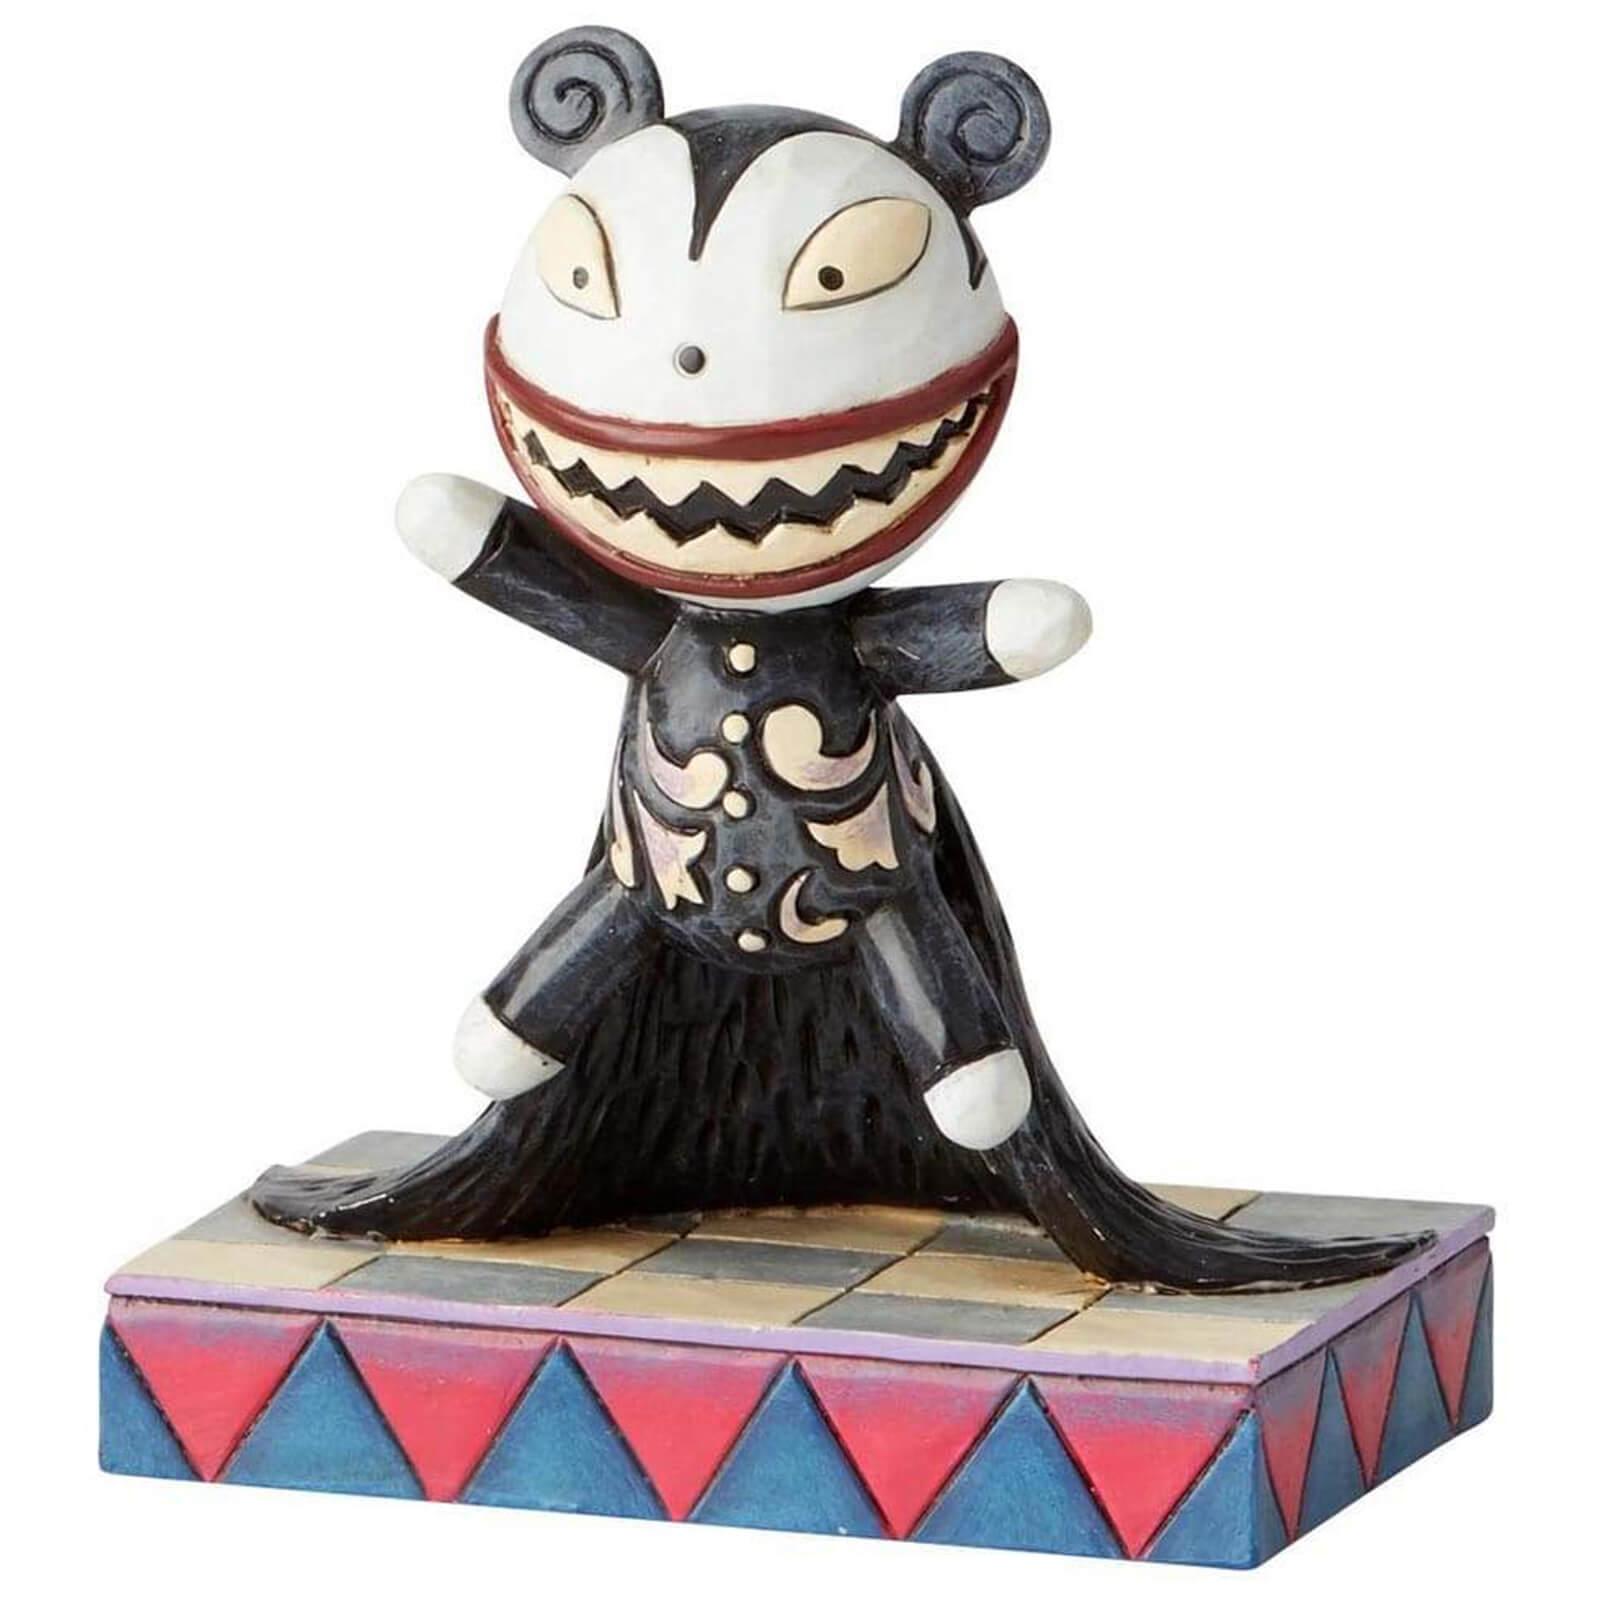 Disney Traditions Scary Teddy Figurine